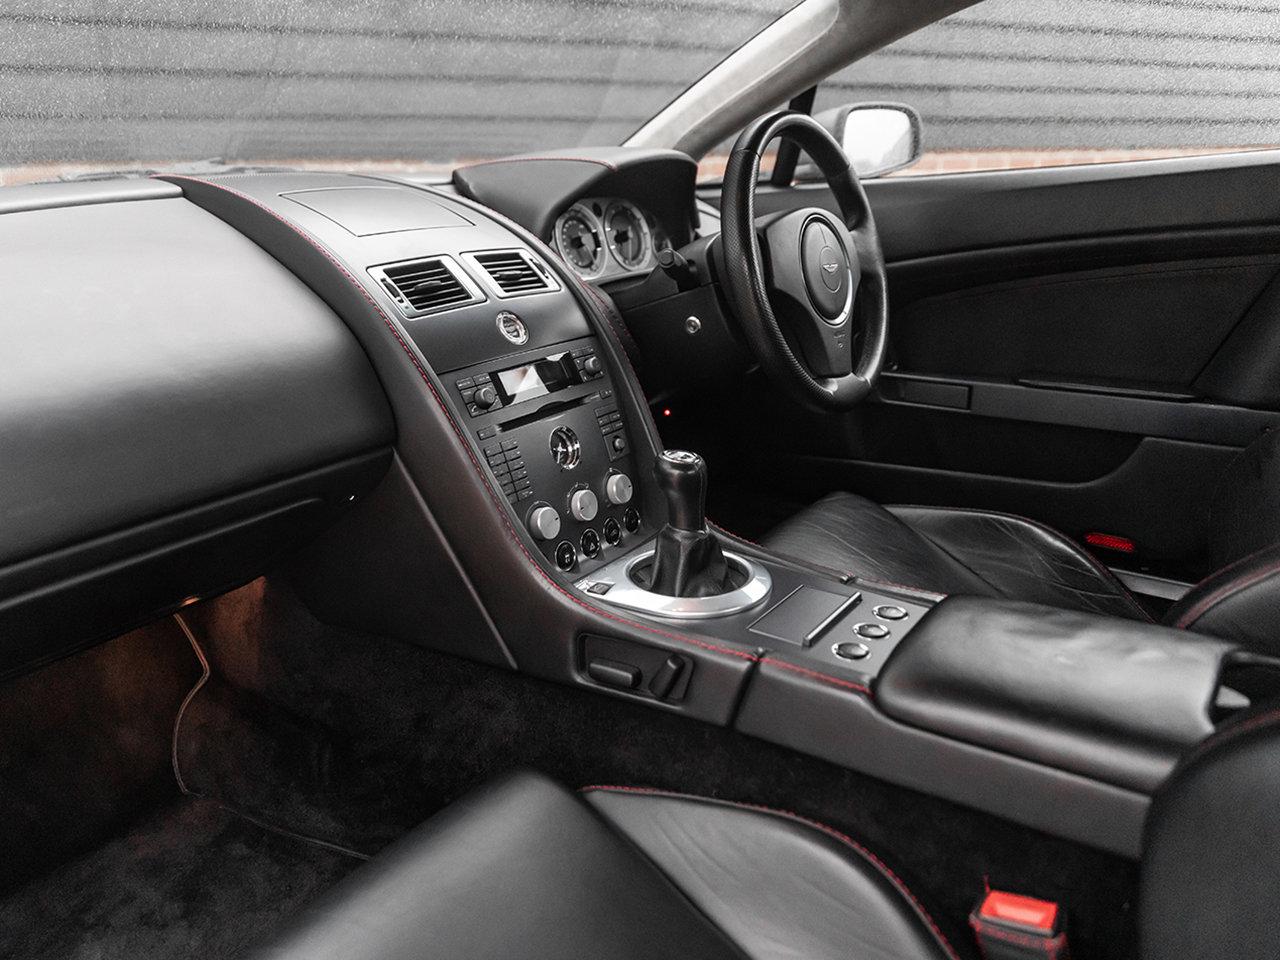 2006 Aston Martin V8 Vantage - Prodrive  For Sale (picture 4 of 6)